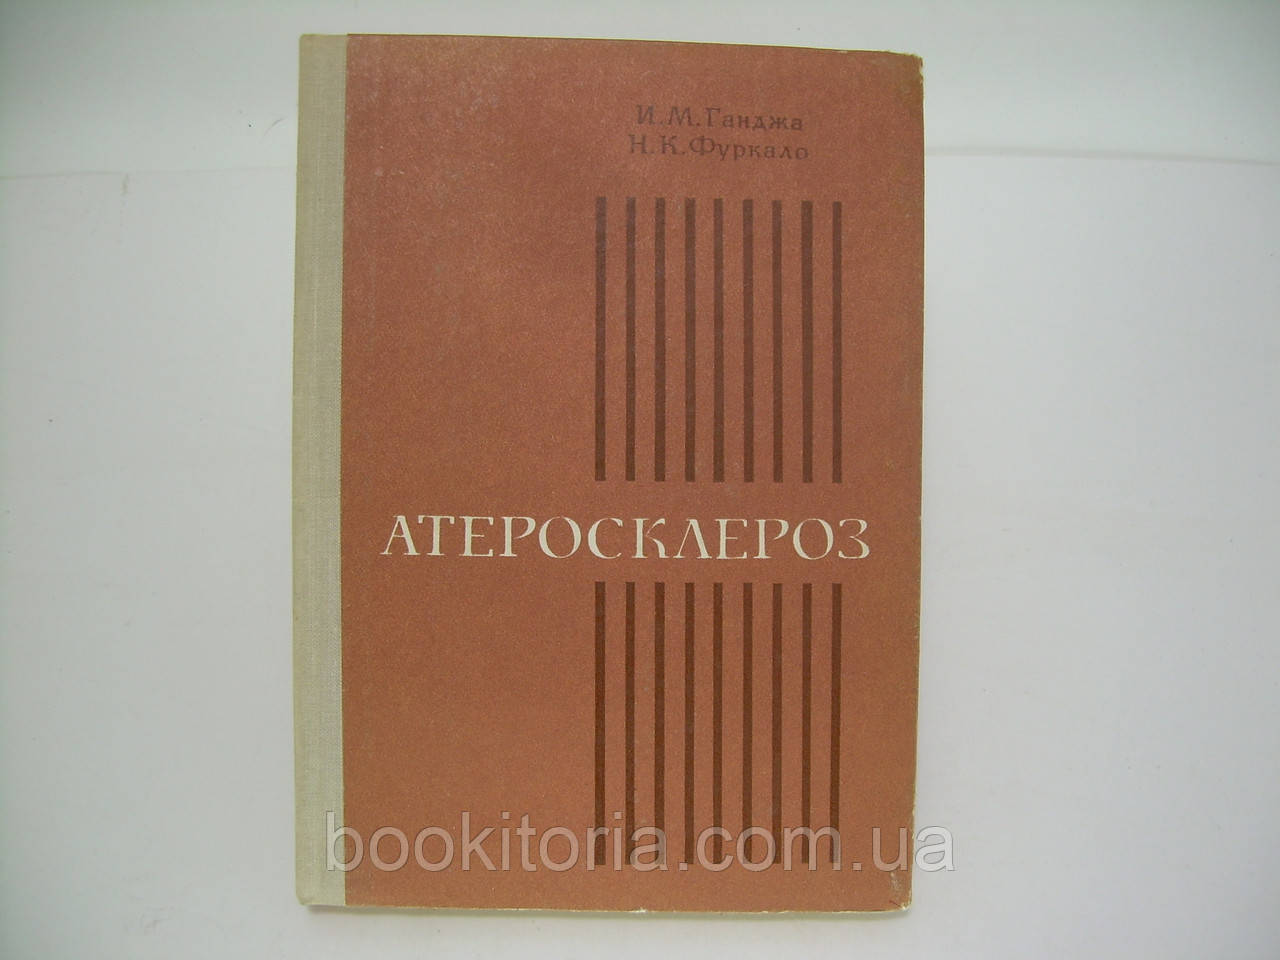 Ганджа И., Фуркало Н. Атеросклероз (б/у).